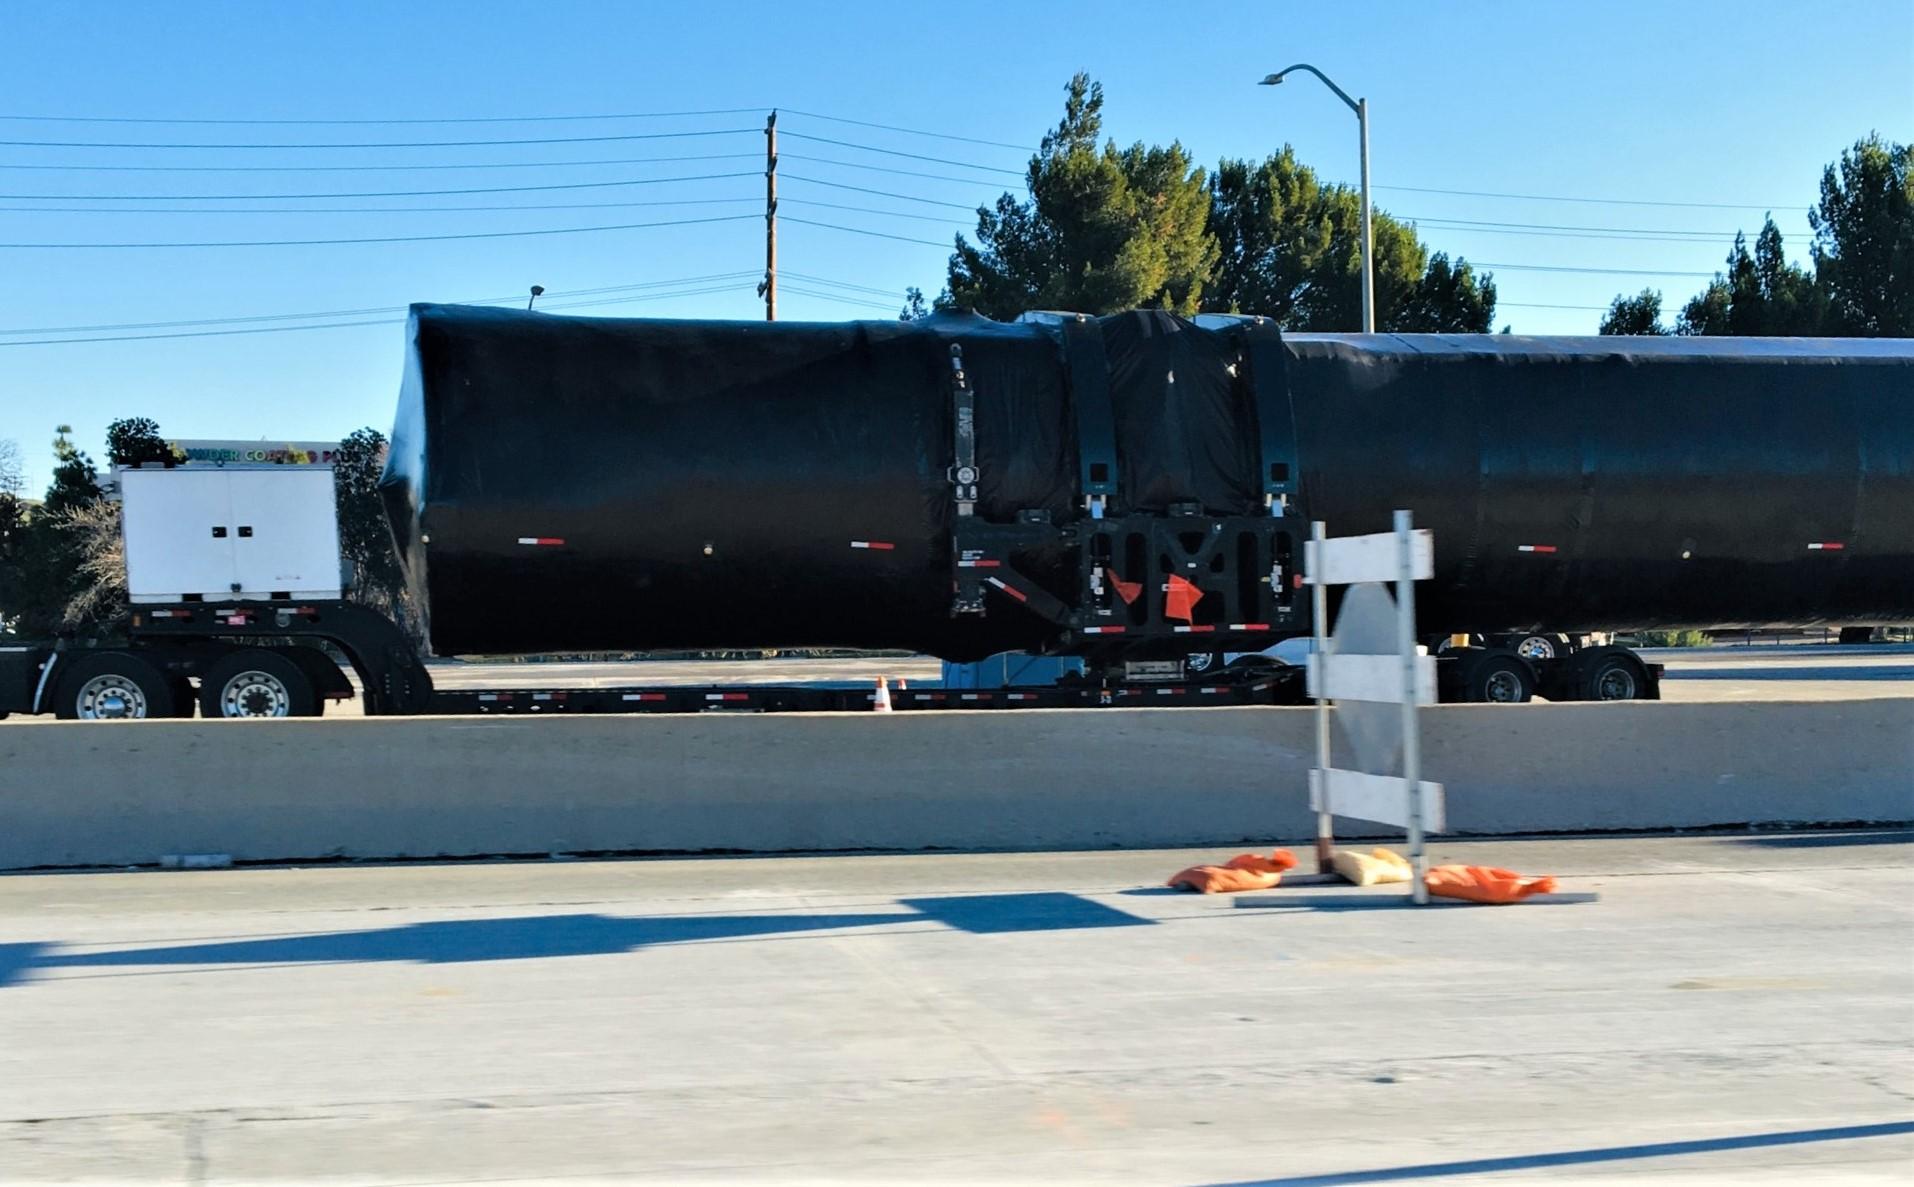 Falcon 9 booster I-5N Valencia CA 012219 (Reddit – intamin1) 1